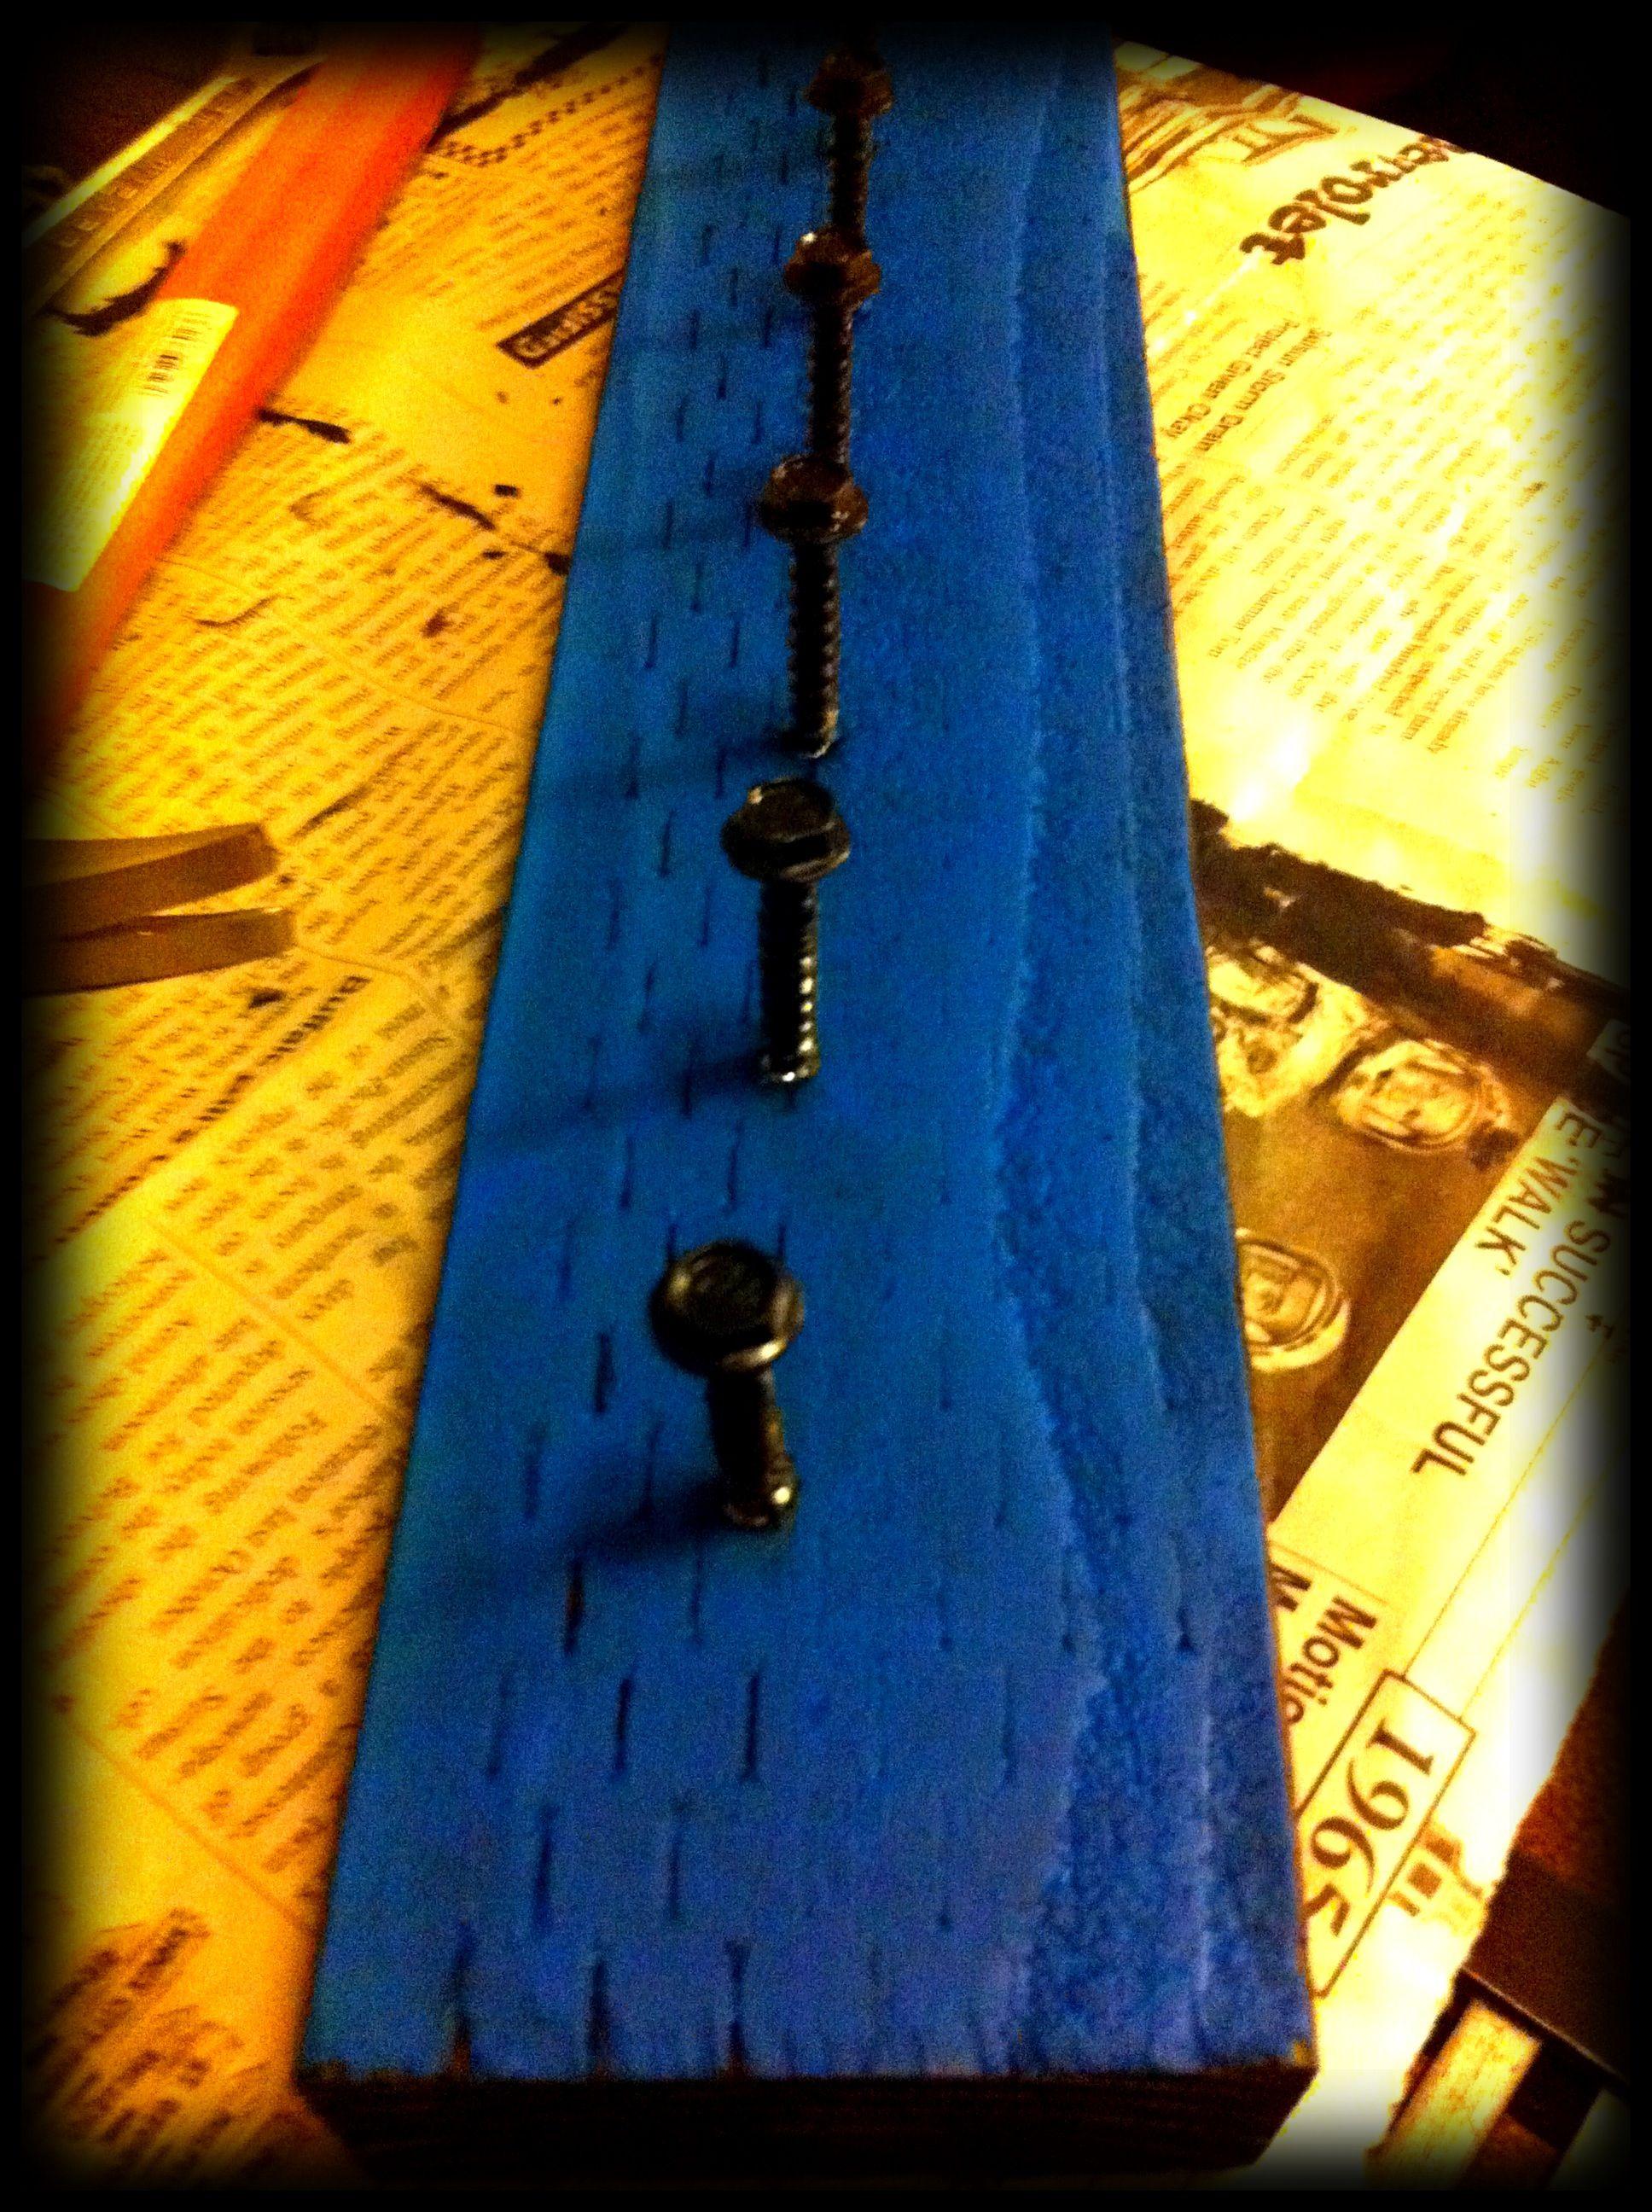 DIY hat rack- $.50 piece of scrap wood, $.19 screws, & paint